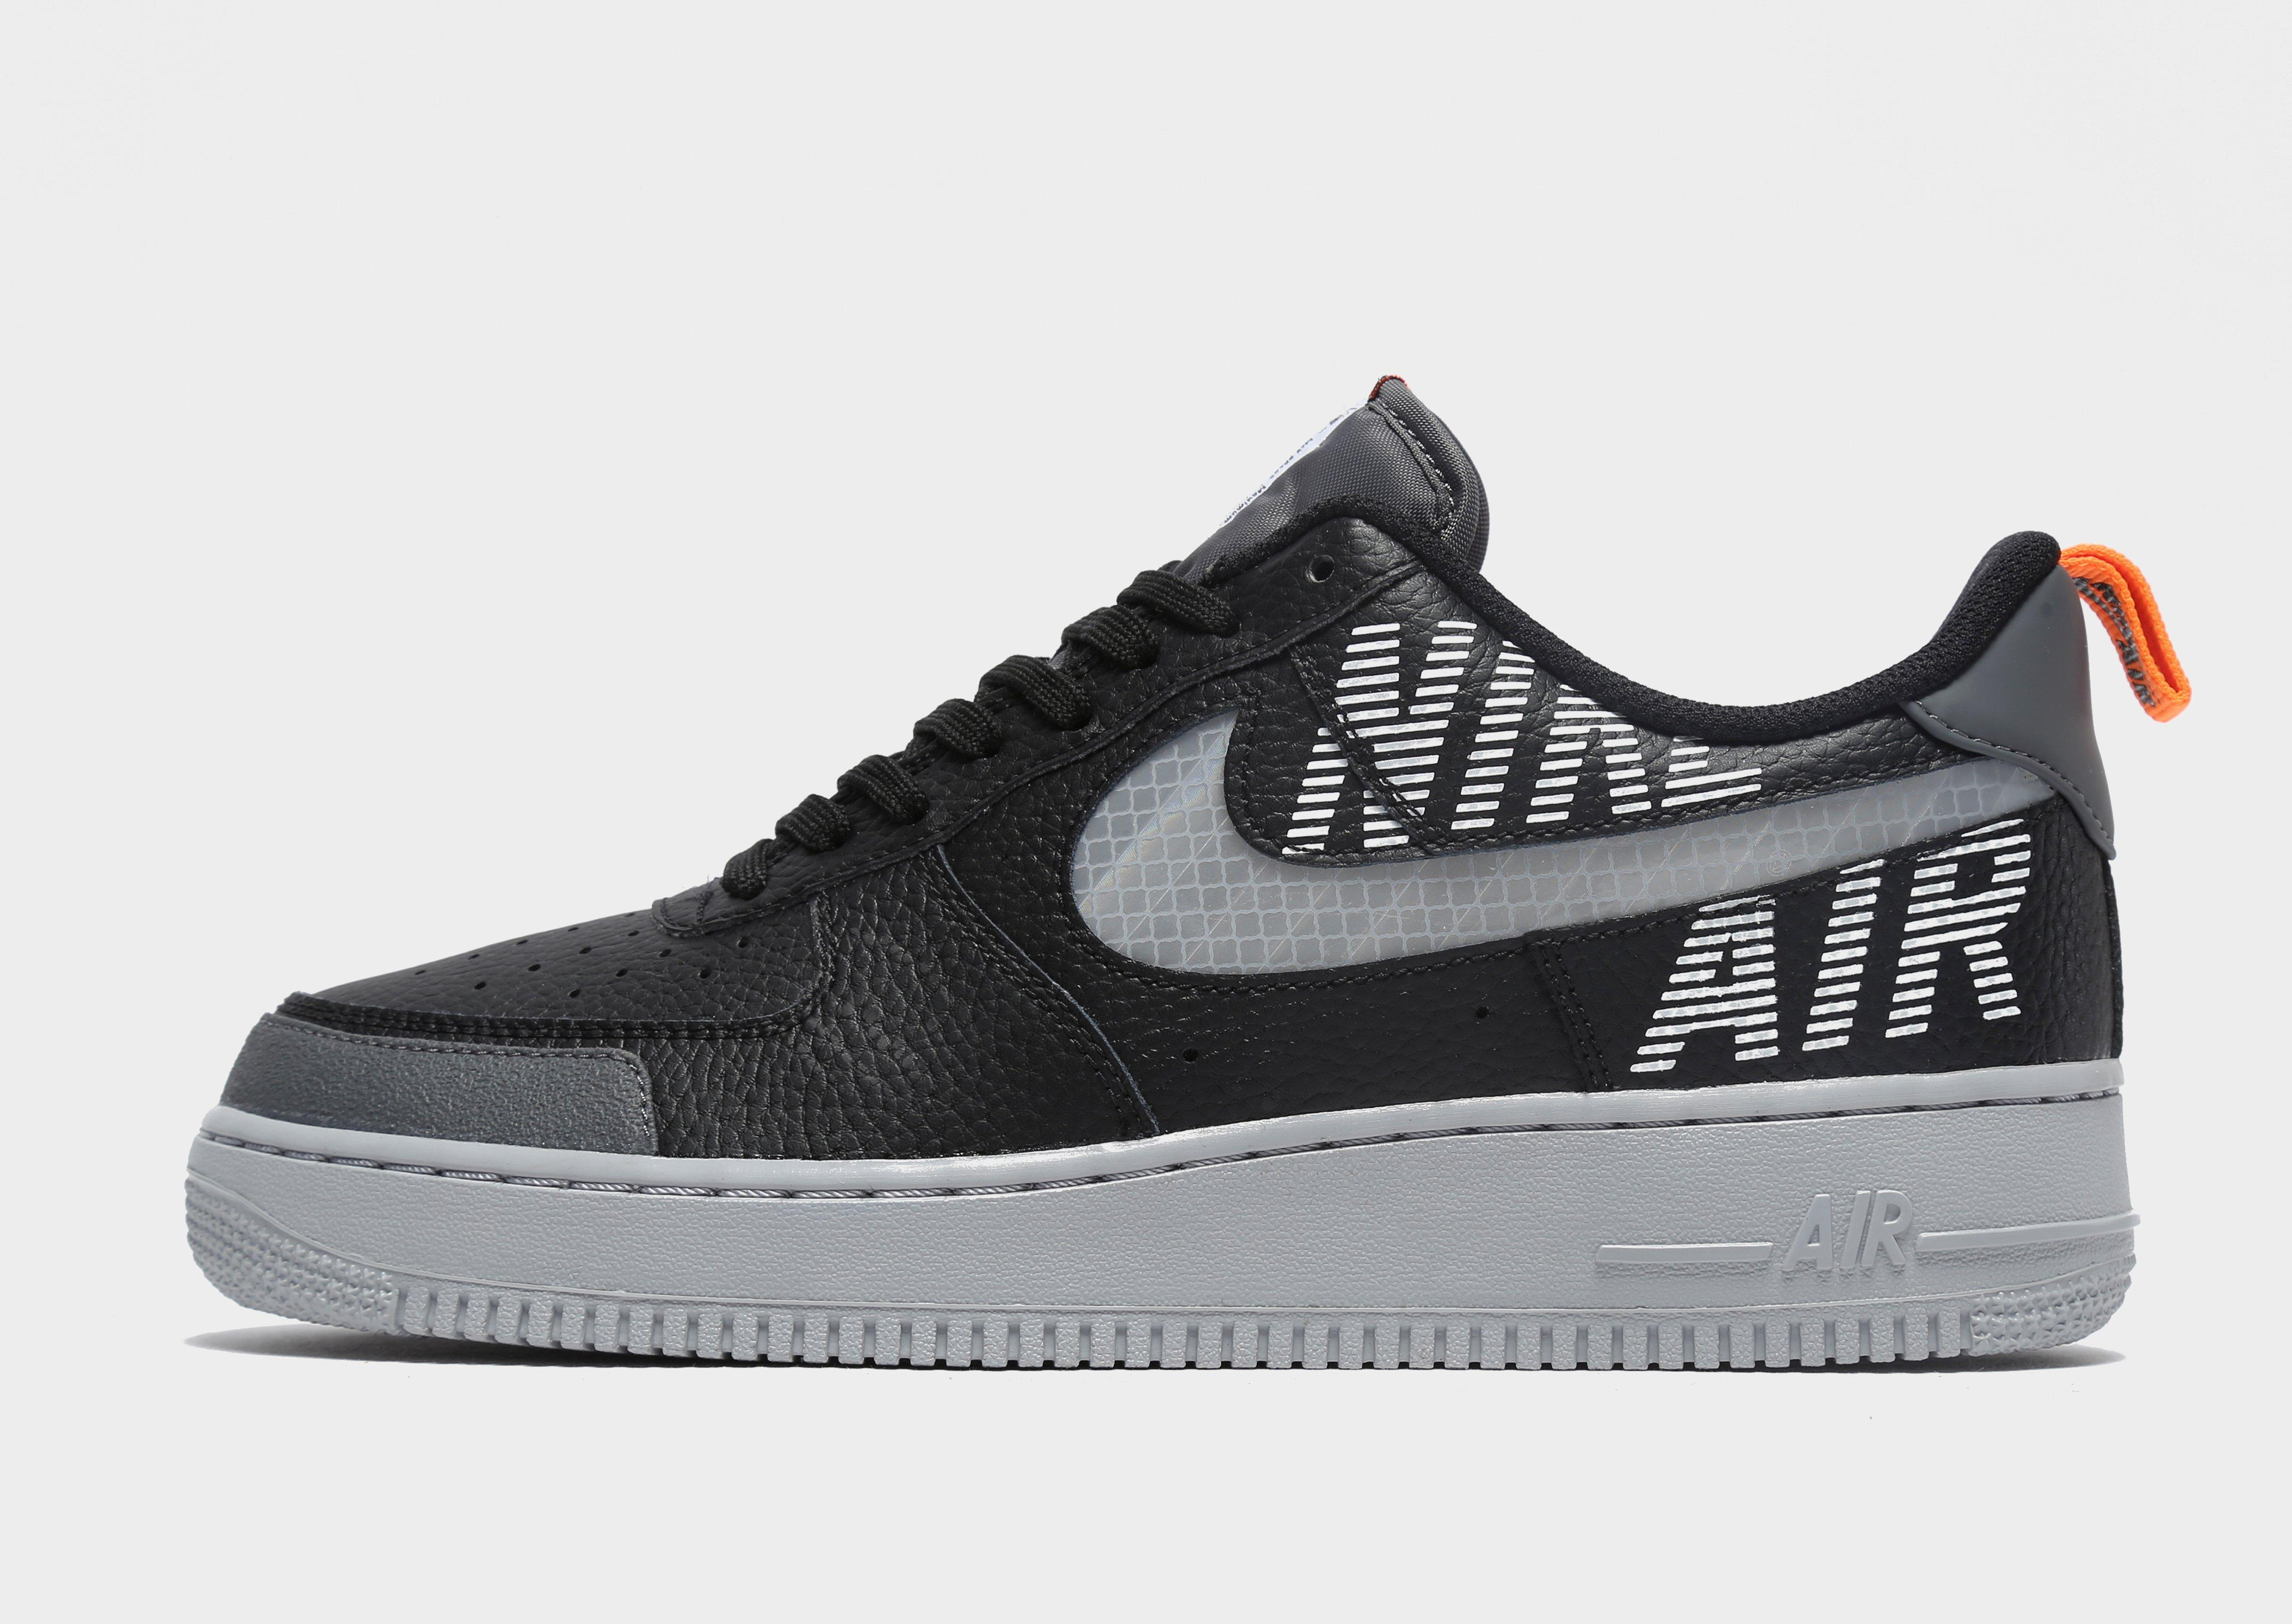 nike air force 1 black grey